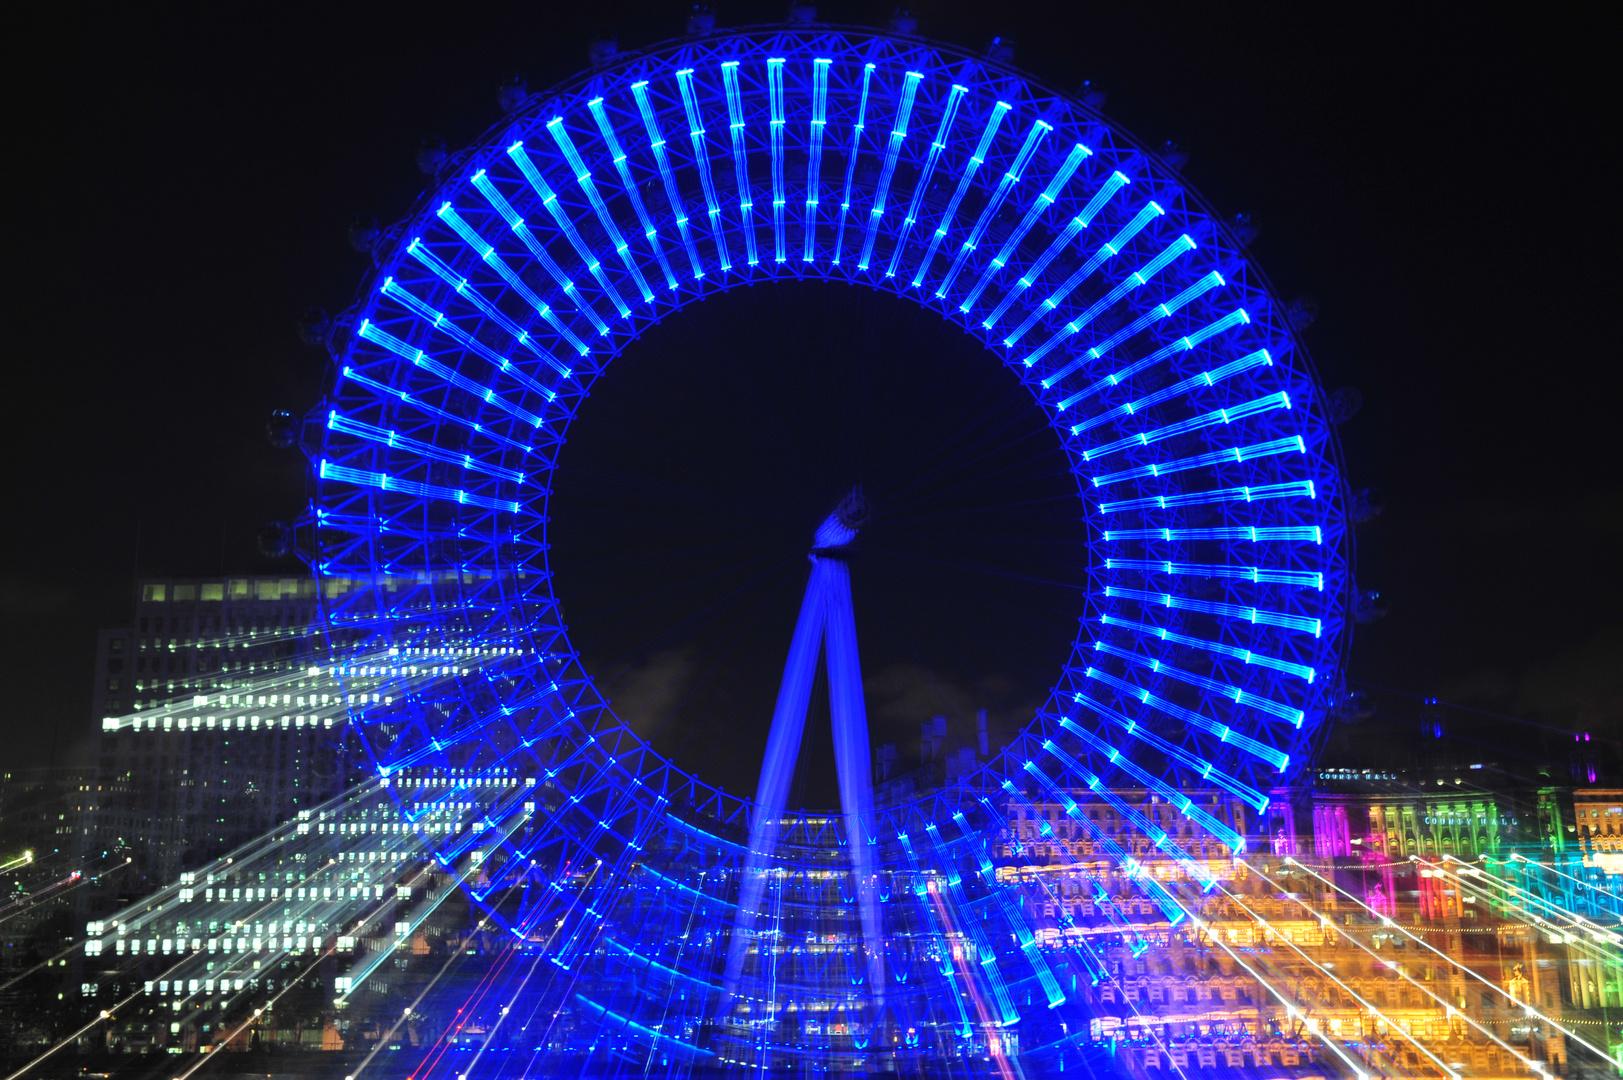 London Eye, stepped